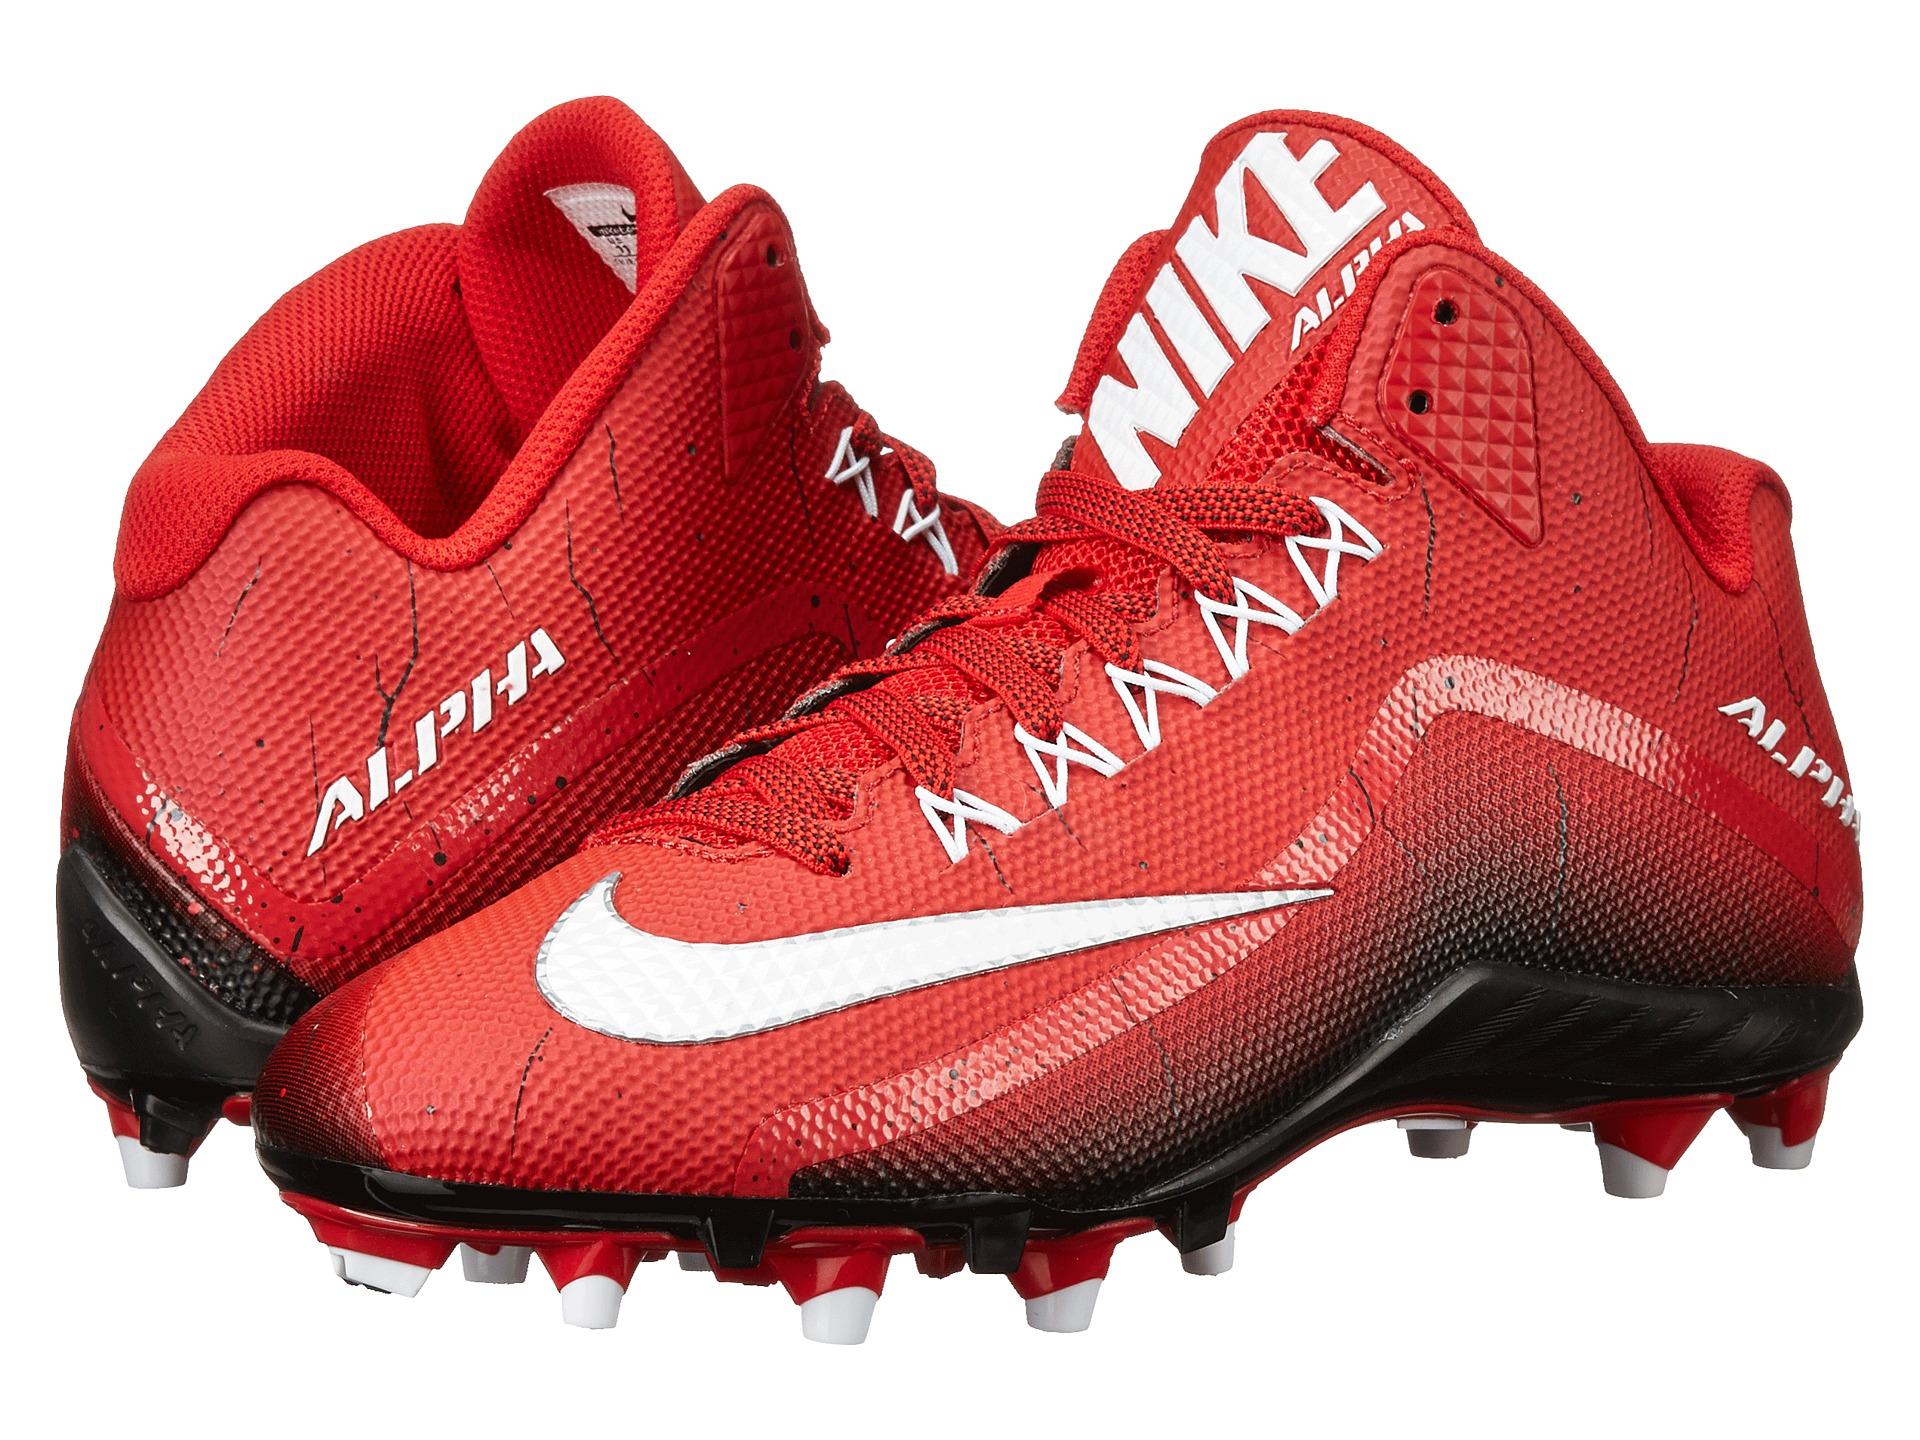 cb0100aeb721 Nike Nfl Alpha Pro Td Low Chiefs